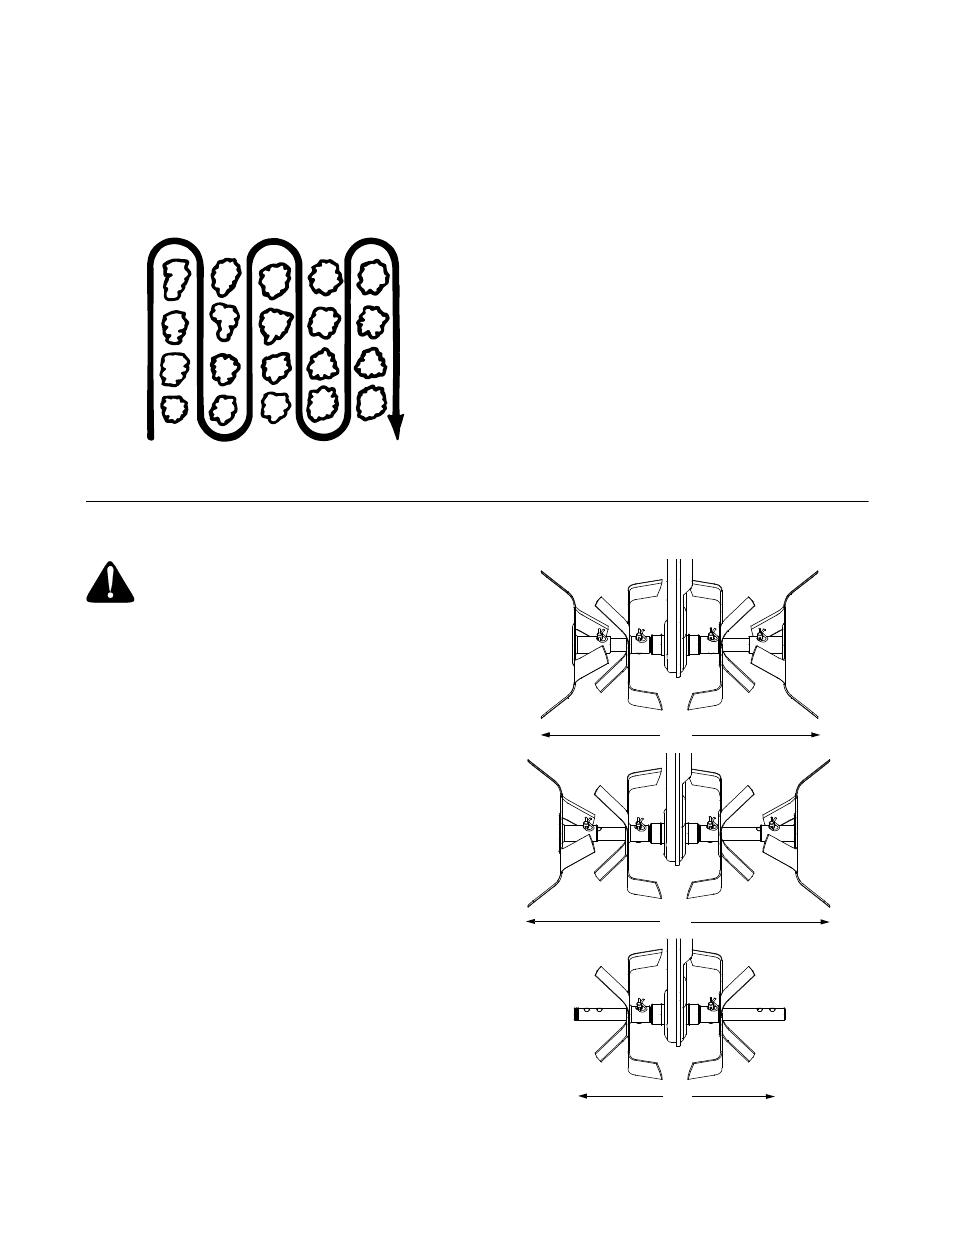 Engine Adjustment Wheel Depth Stake Mtd Front Tine Tiller 300 User Manual Page 9 20